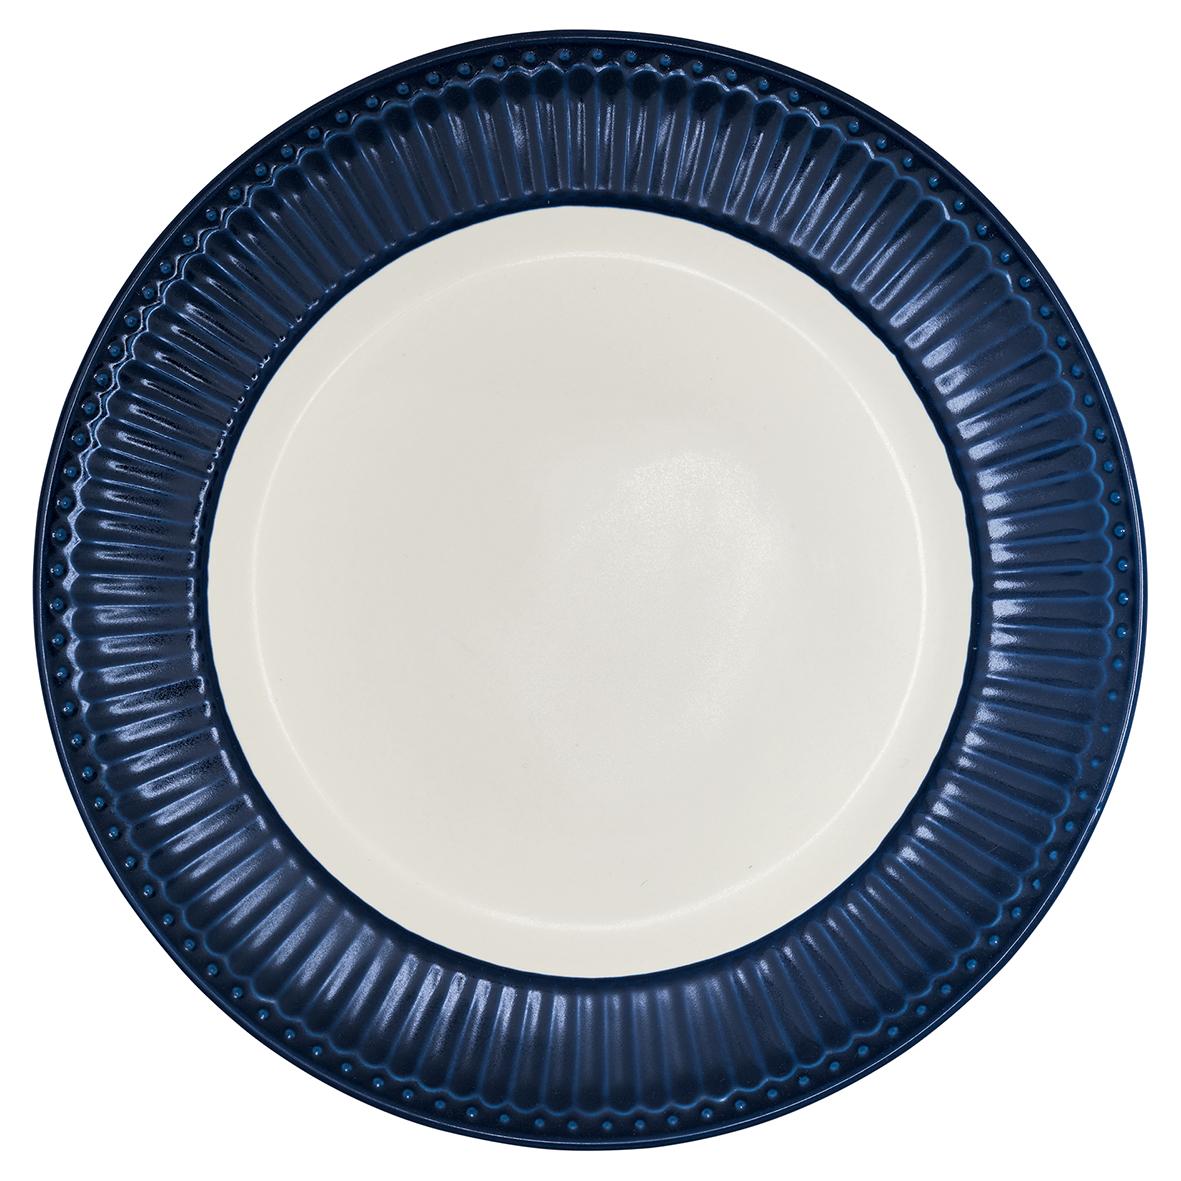 Greengate Frühstücksteller Alice dark blue Everyday